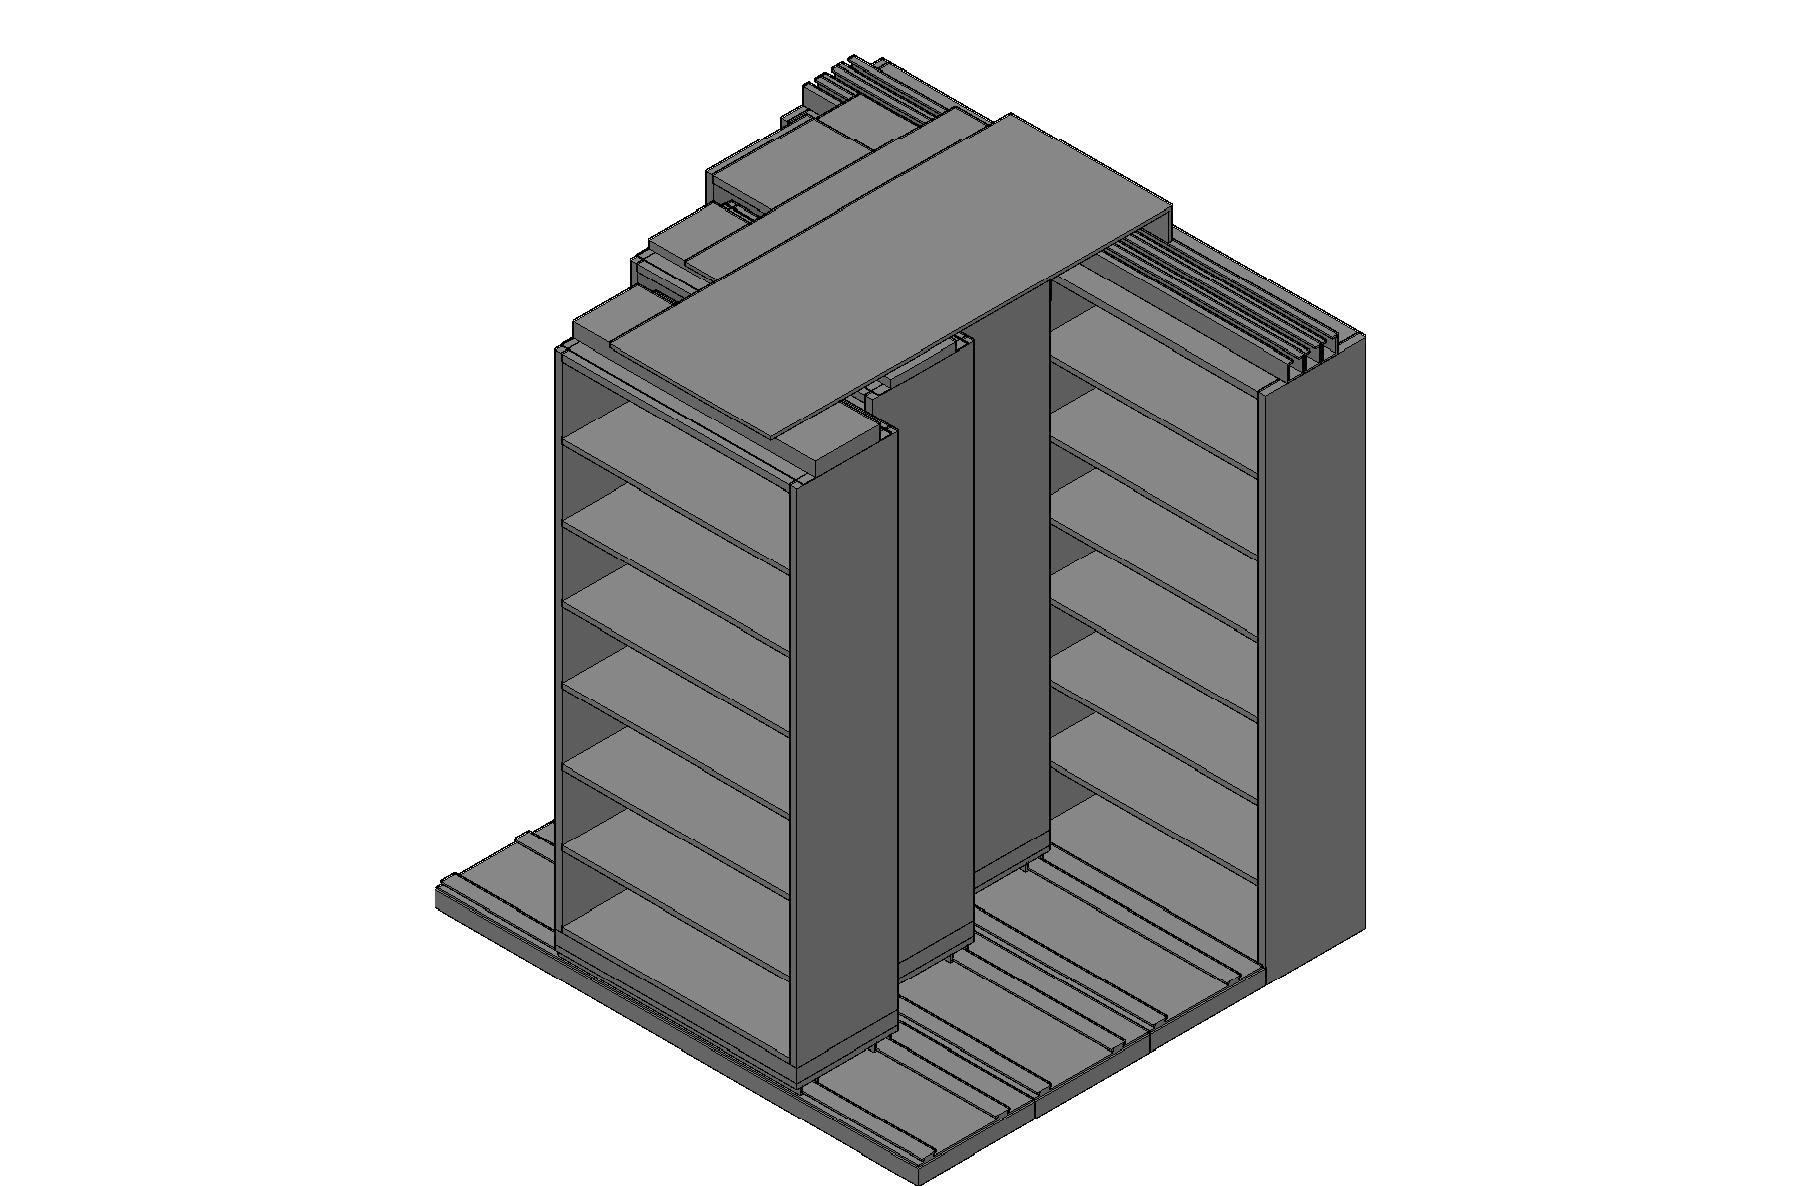 "Legal Size Sliding Shelves - 4 Rows Deep - 7 Levels - (36"" x 15"" Shelves) - 76"" Total Width"